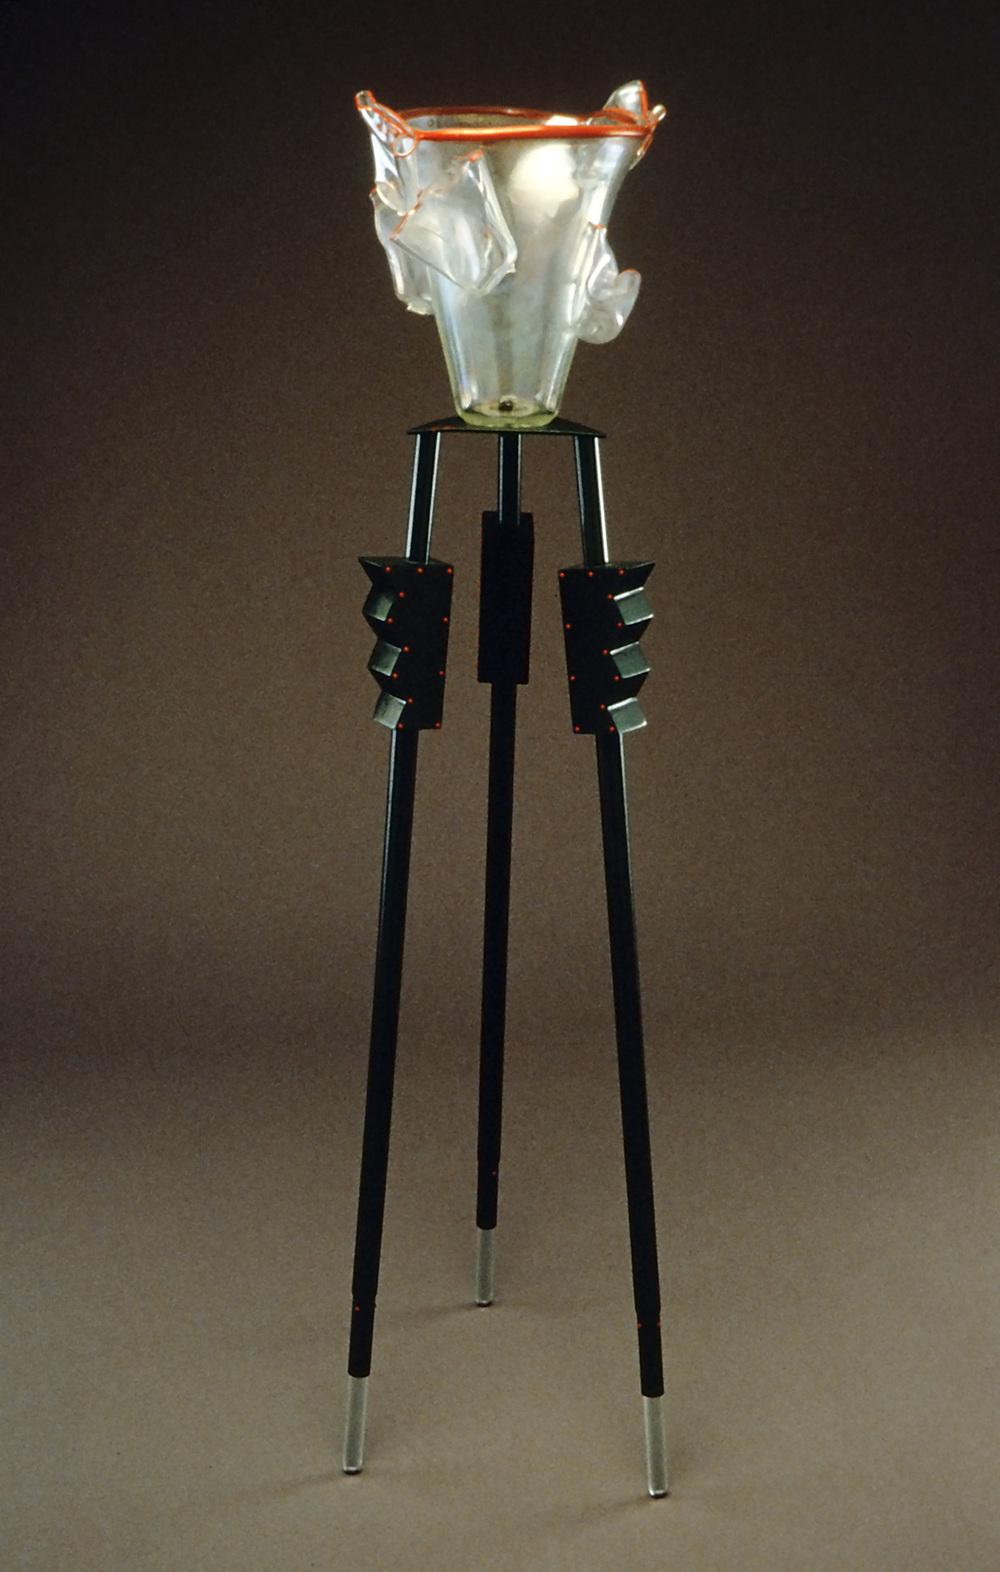 1980 Stick-On 10 PRINT.jpg